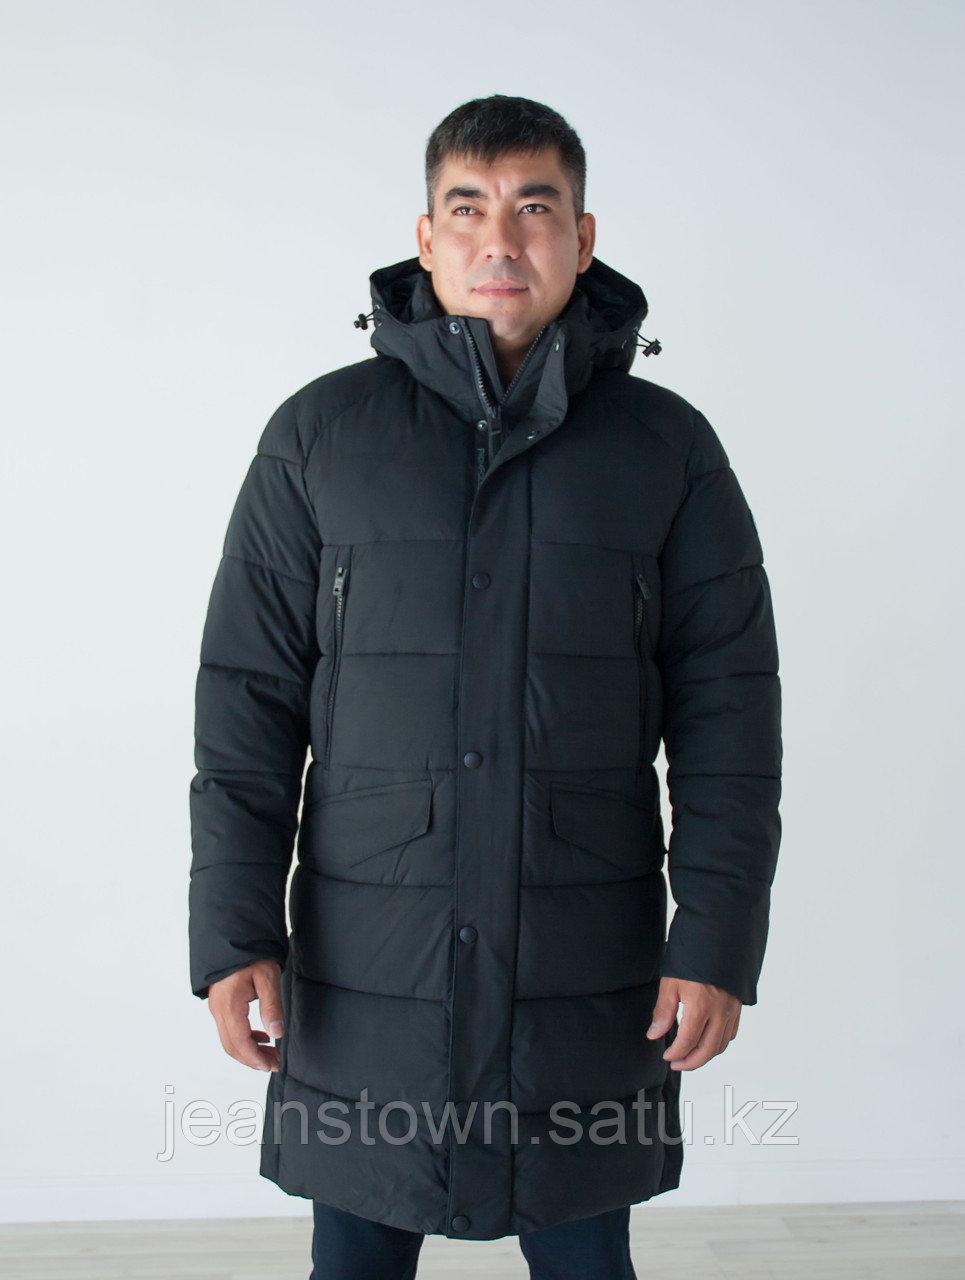 Куртка мужская зимняя  Frompoles  длинная,черная